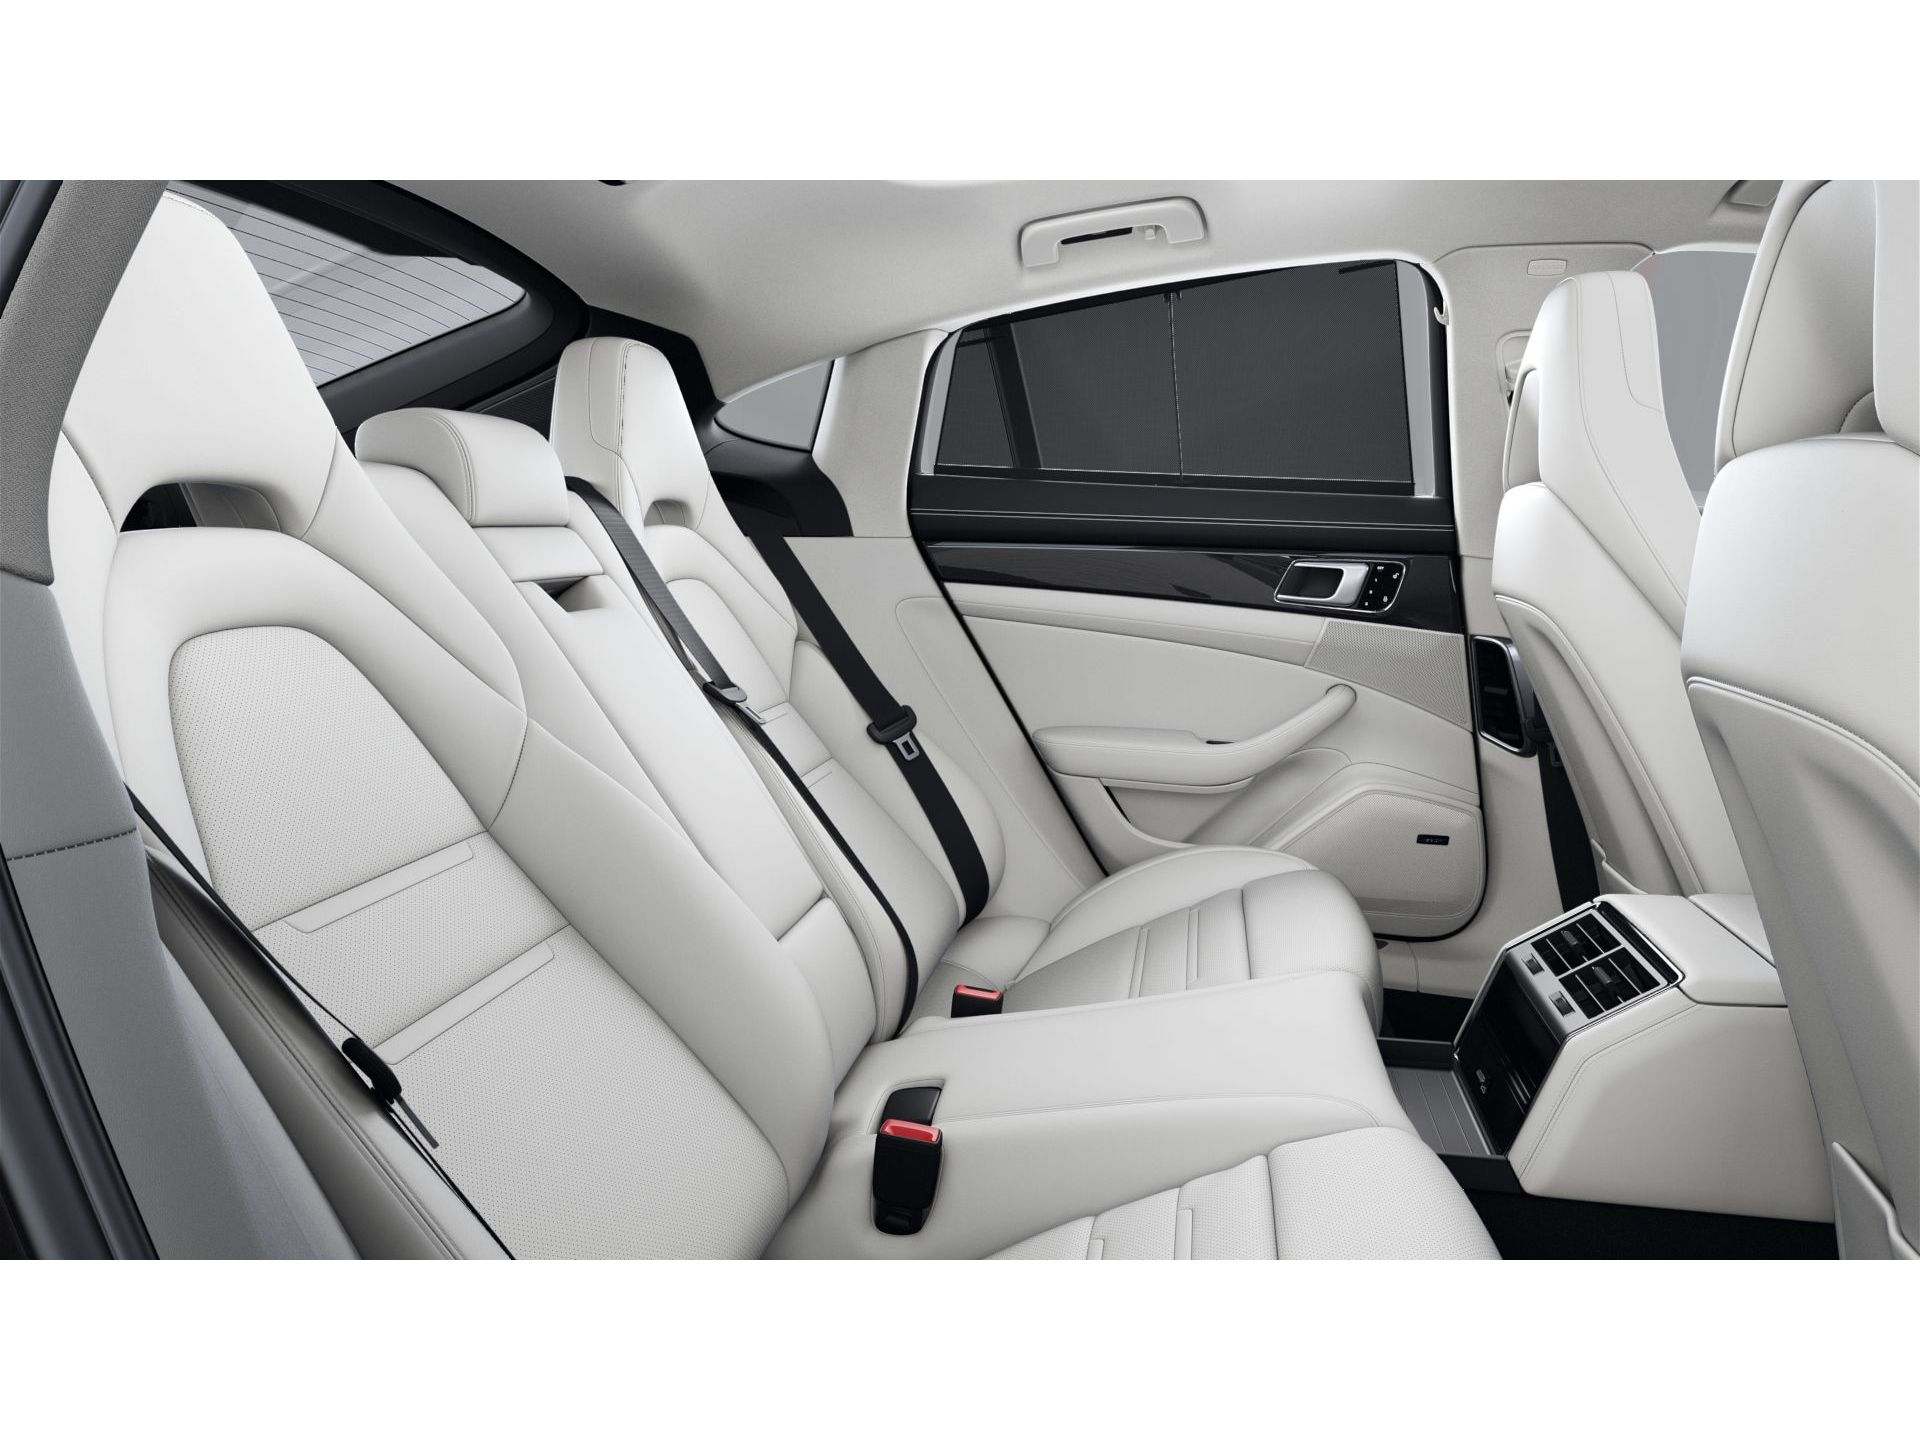 2022 Porsche Panamera 4 E-Hybrid – 4